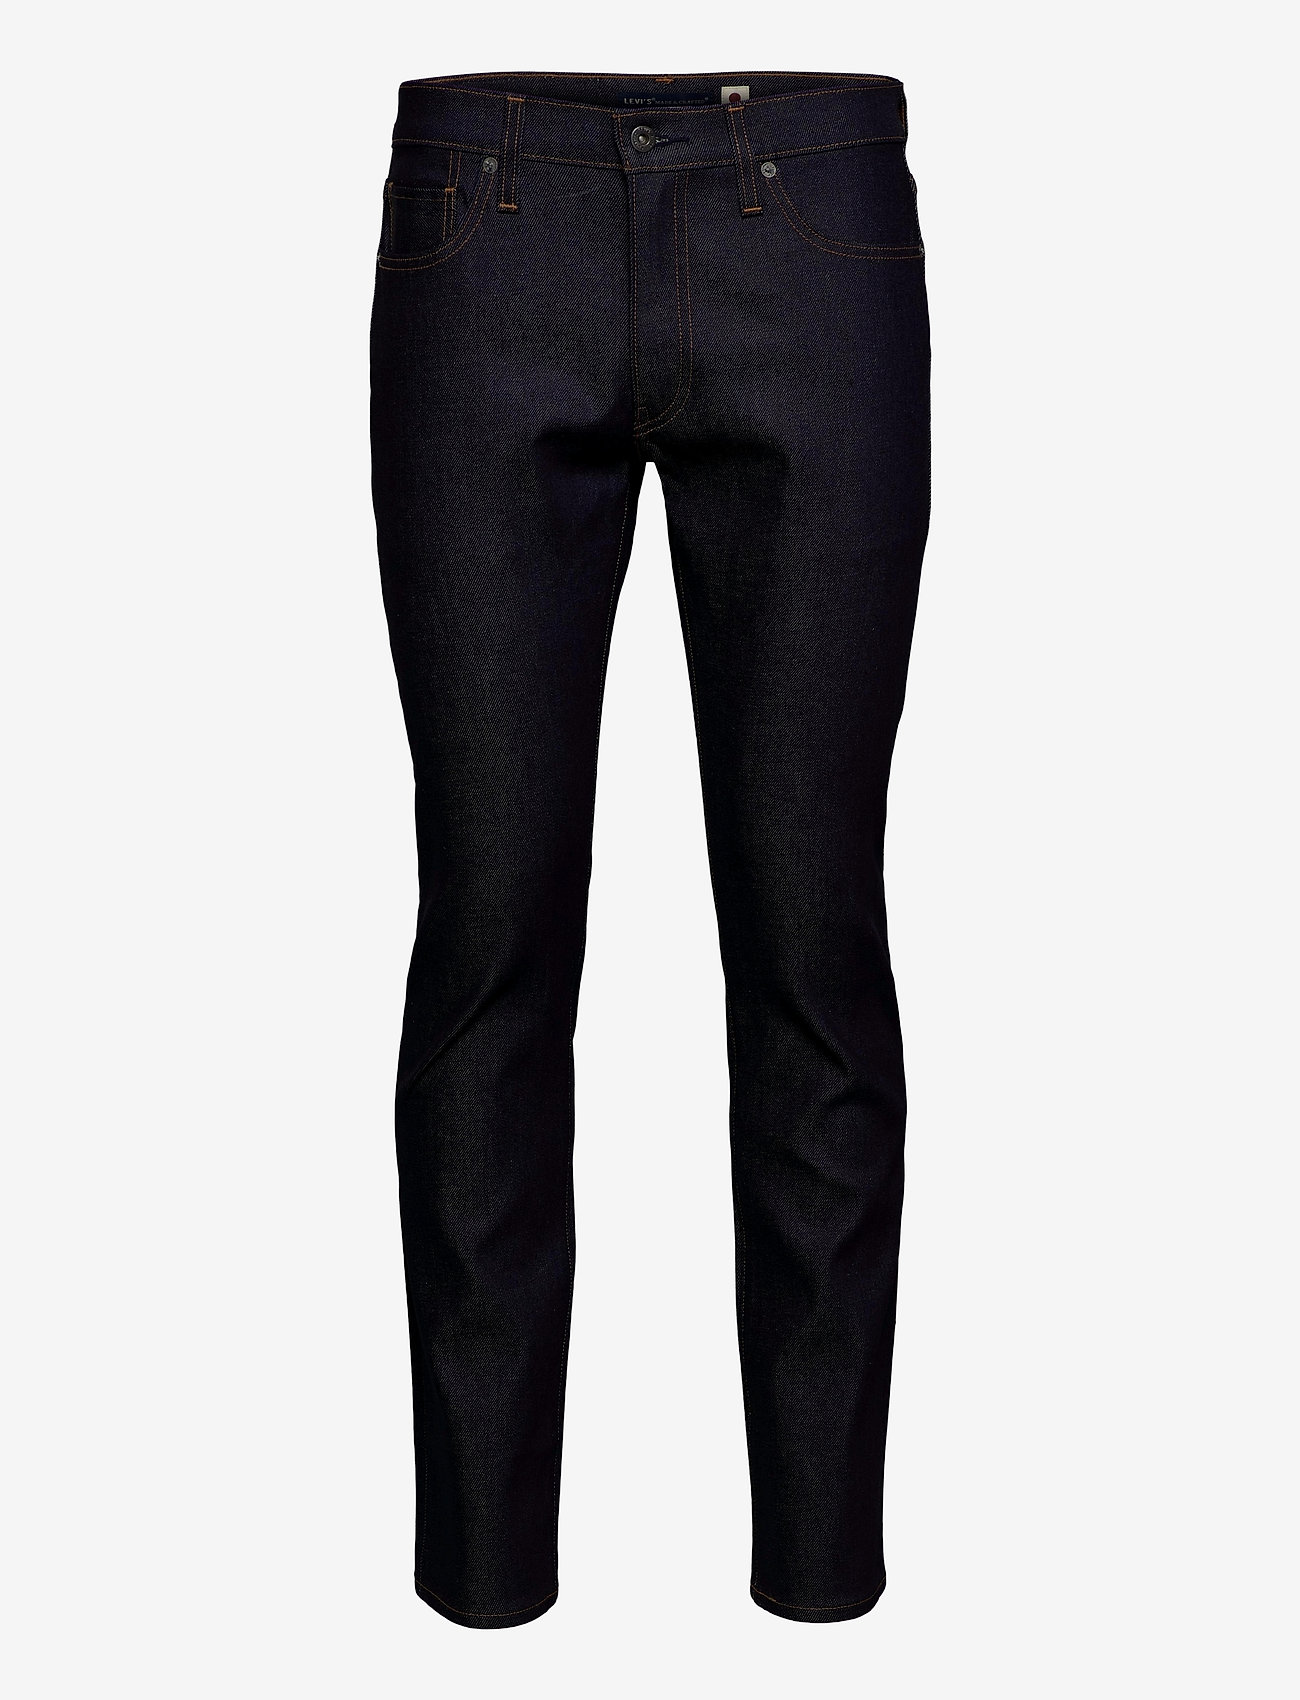 Levi's Made & Crafted - LMC 511 LMC CRISP MOJ - slim jeans - dark indigo - flat finish - 0